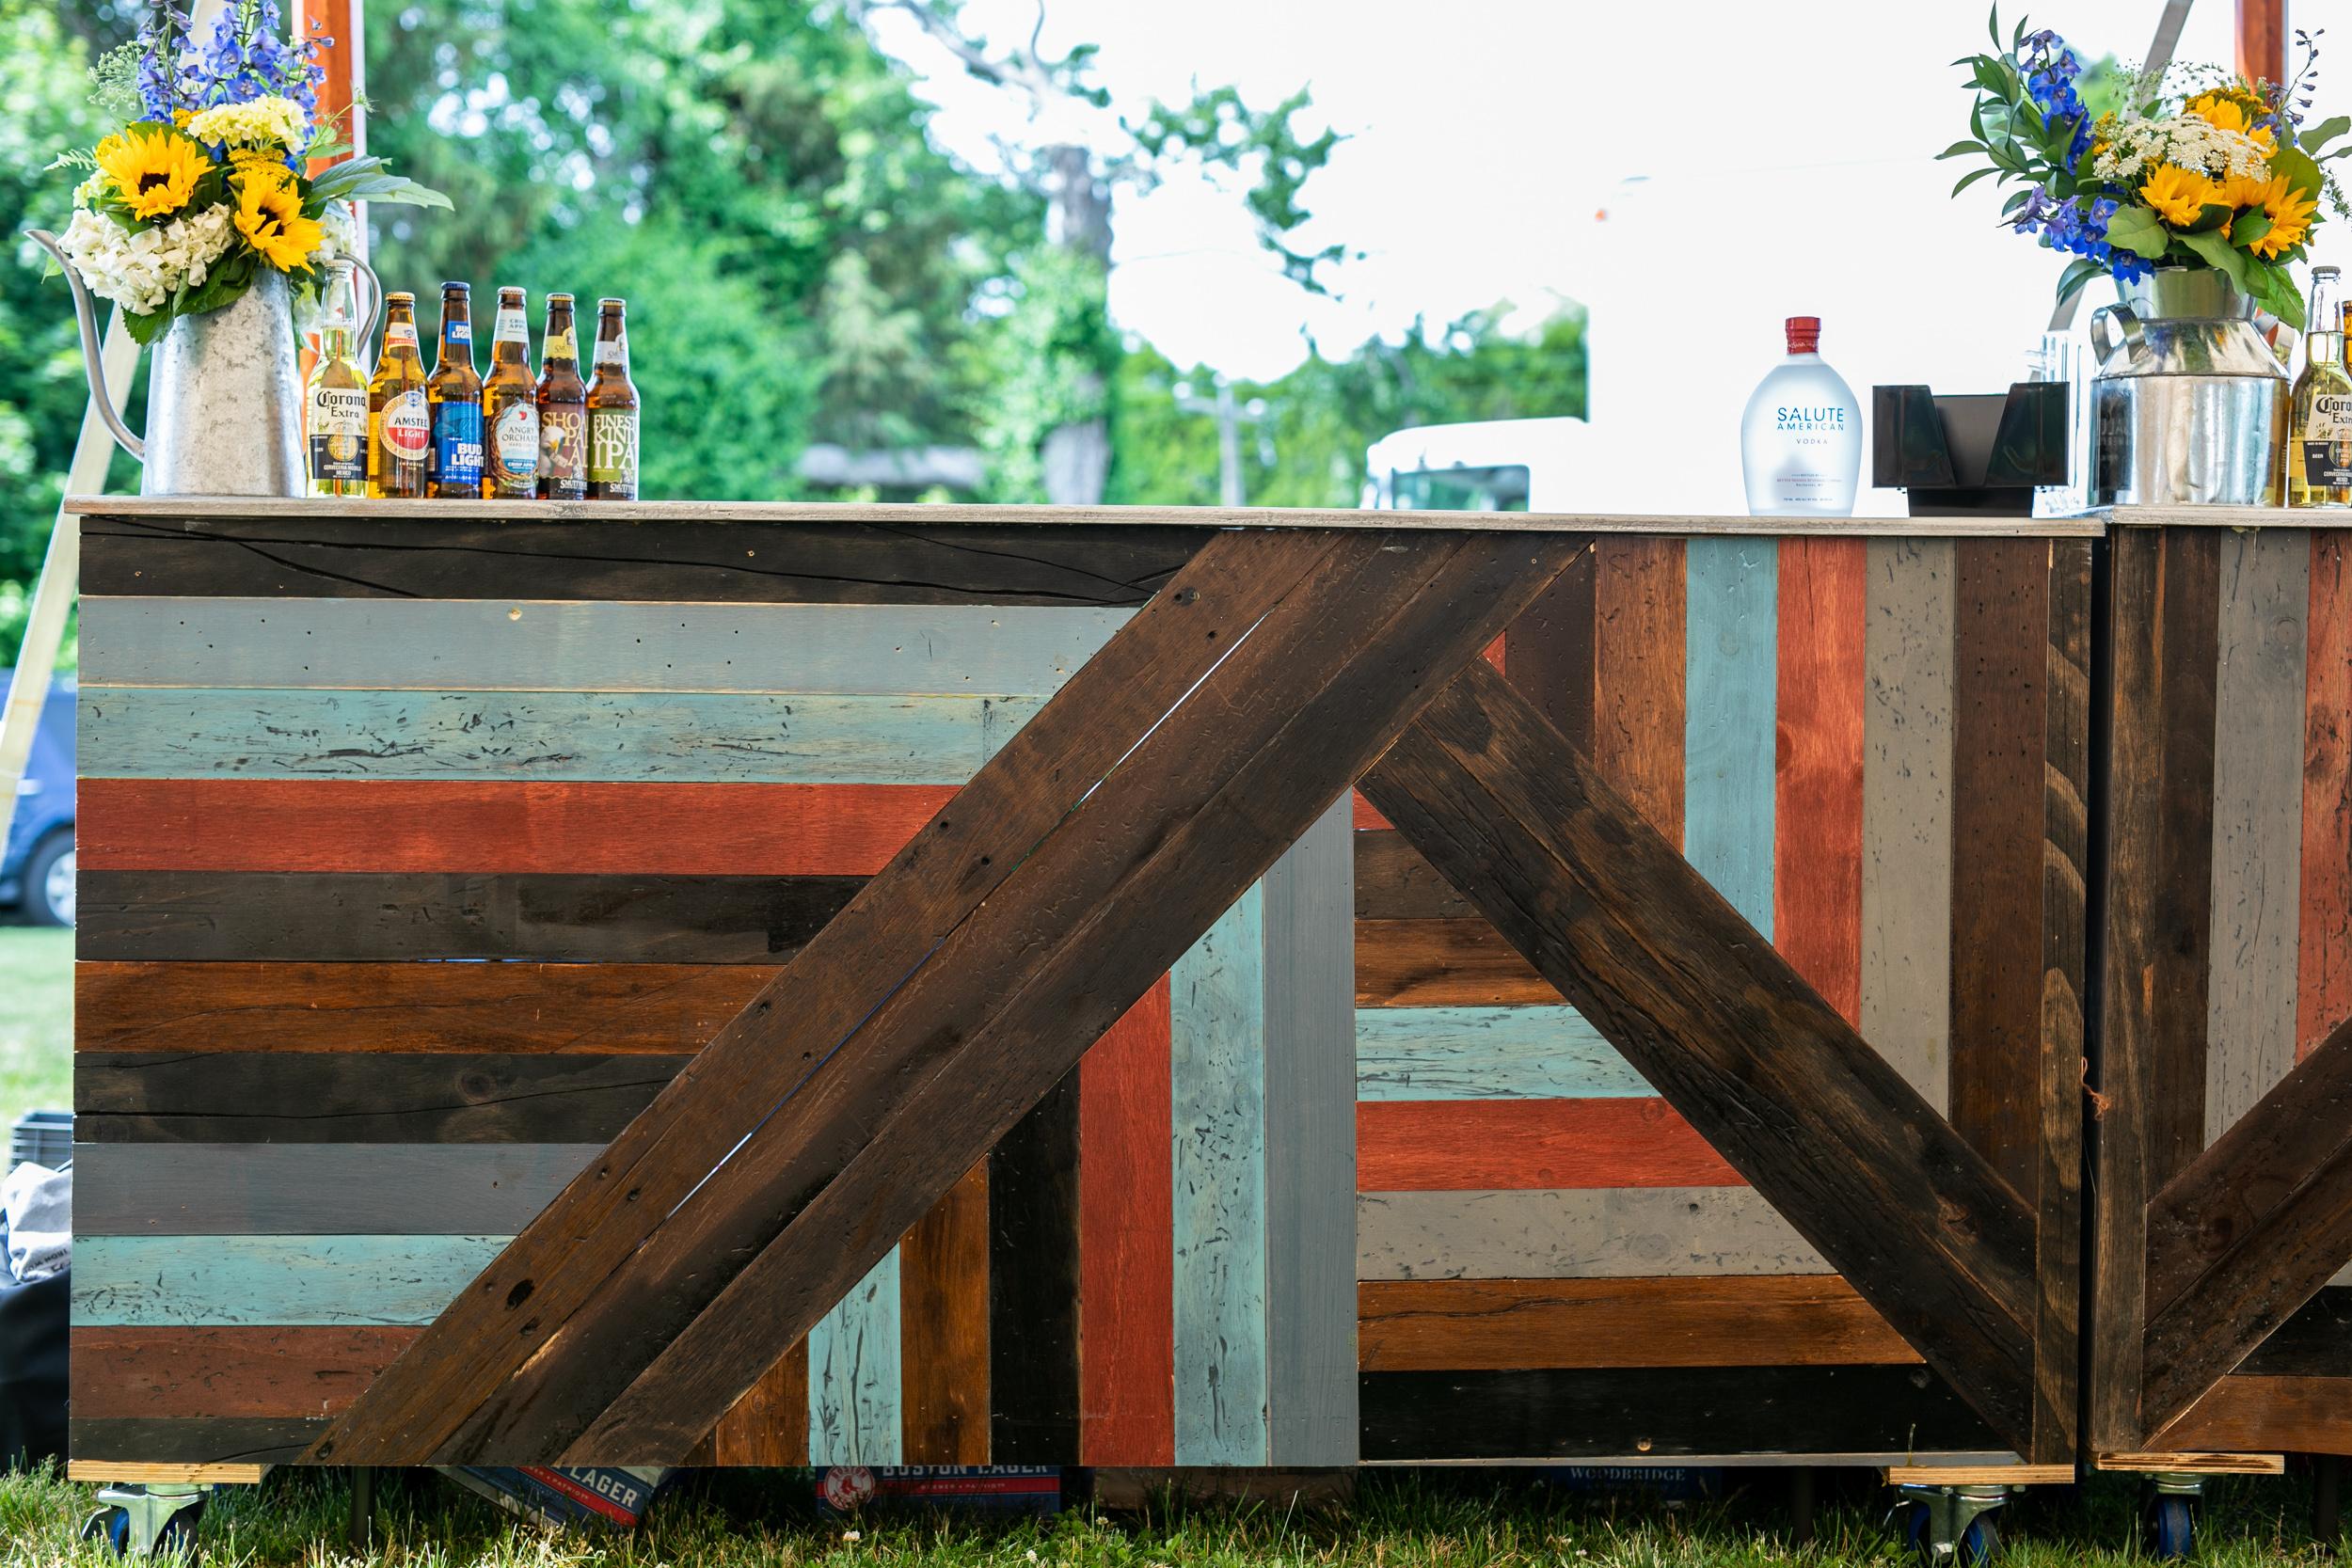 rental_furniture_Malloy_Events_Corporate_Production_Function_Rustic_design_decor_furnishing_custom_bar